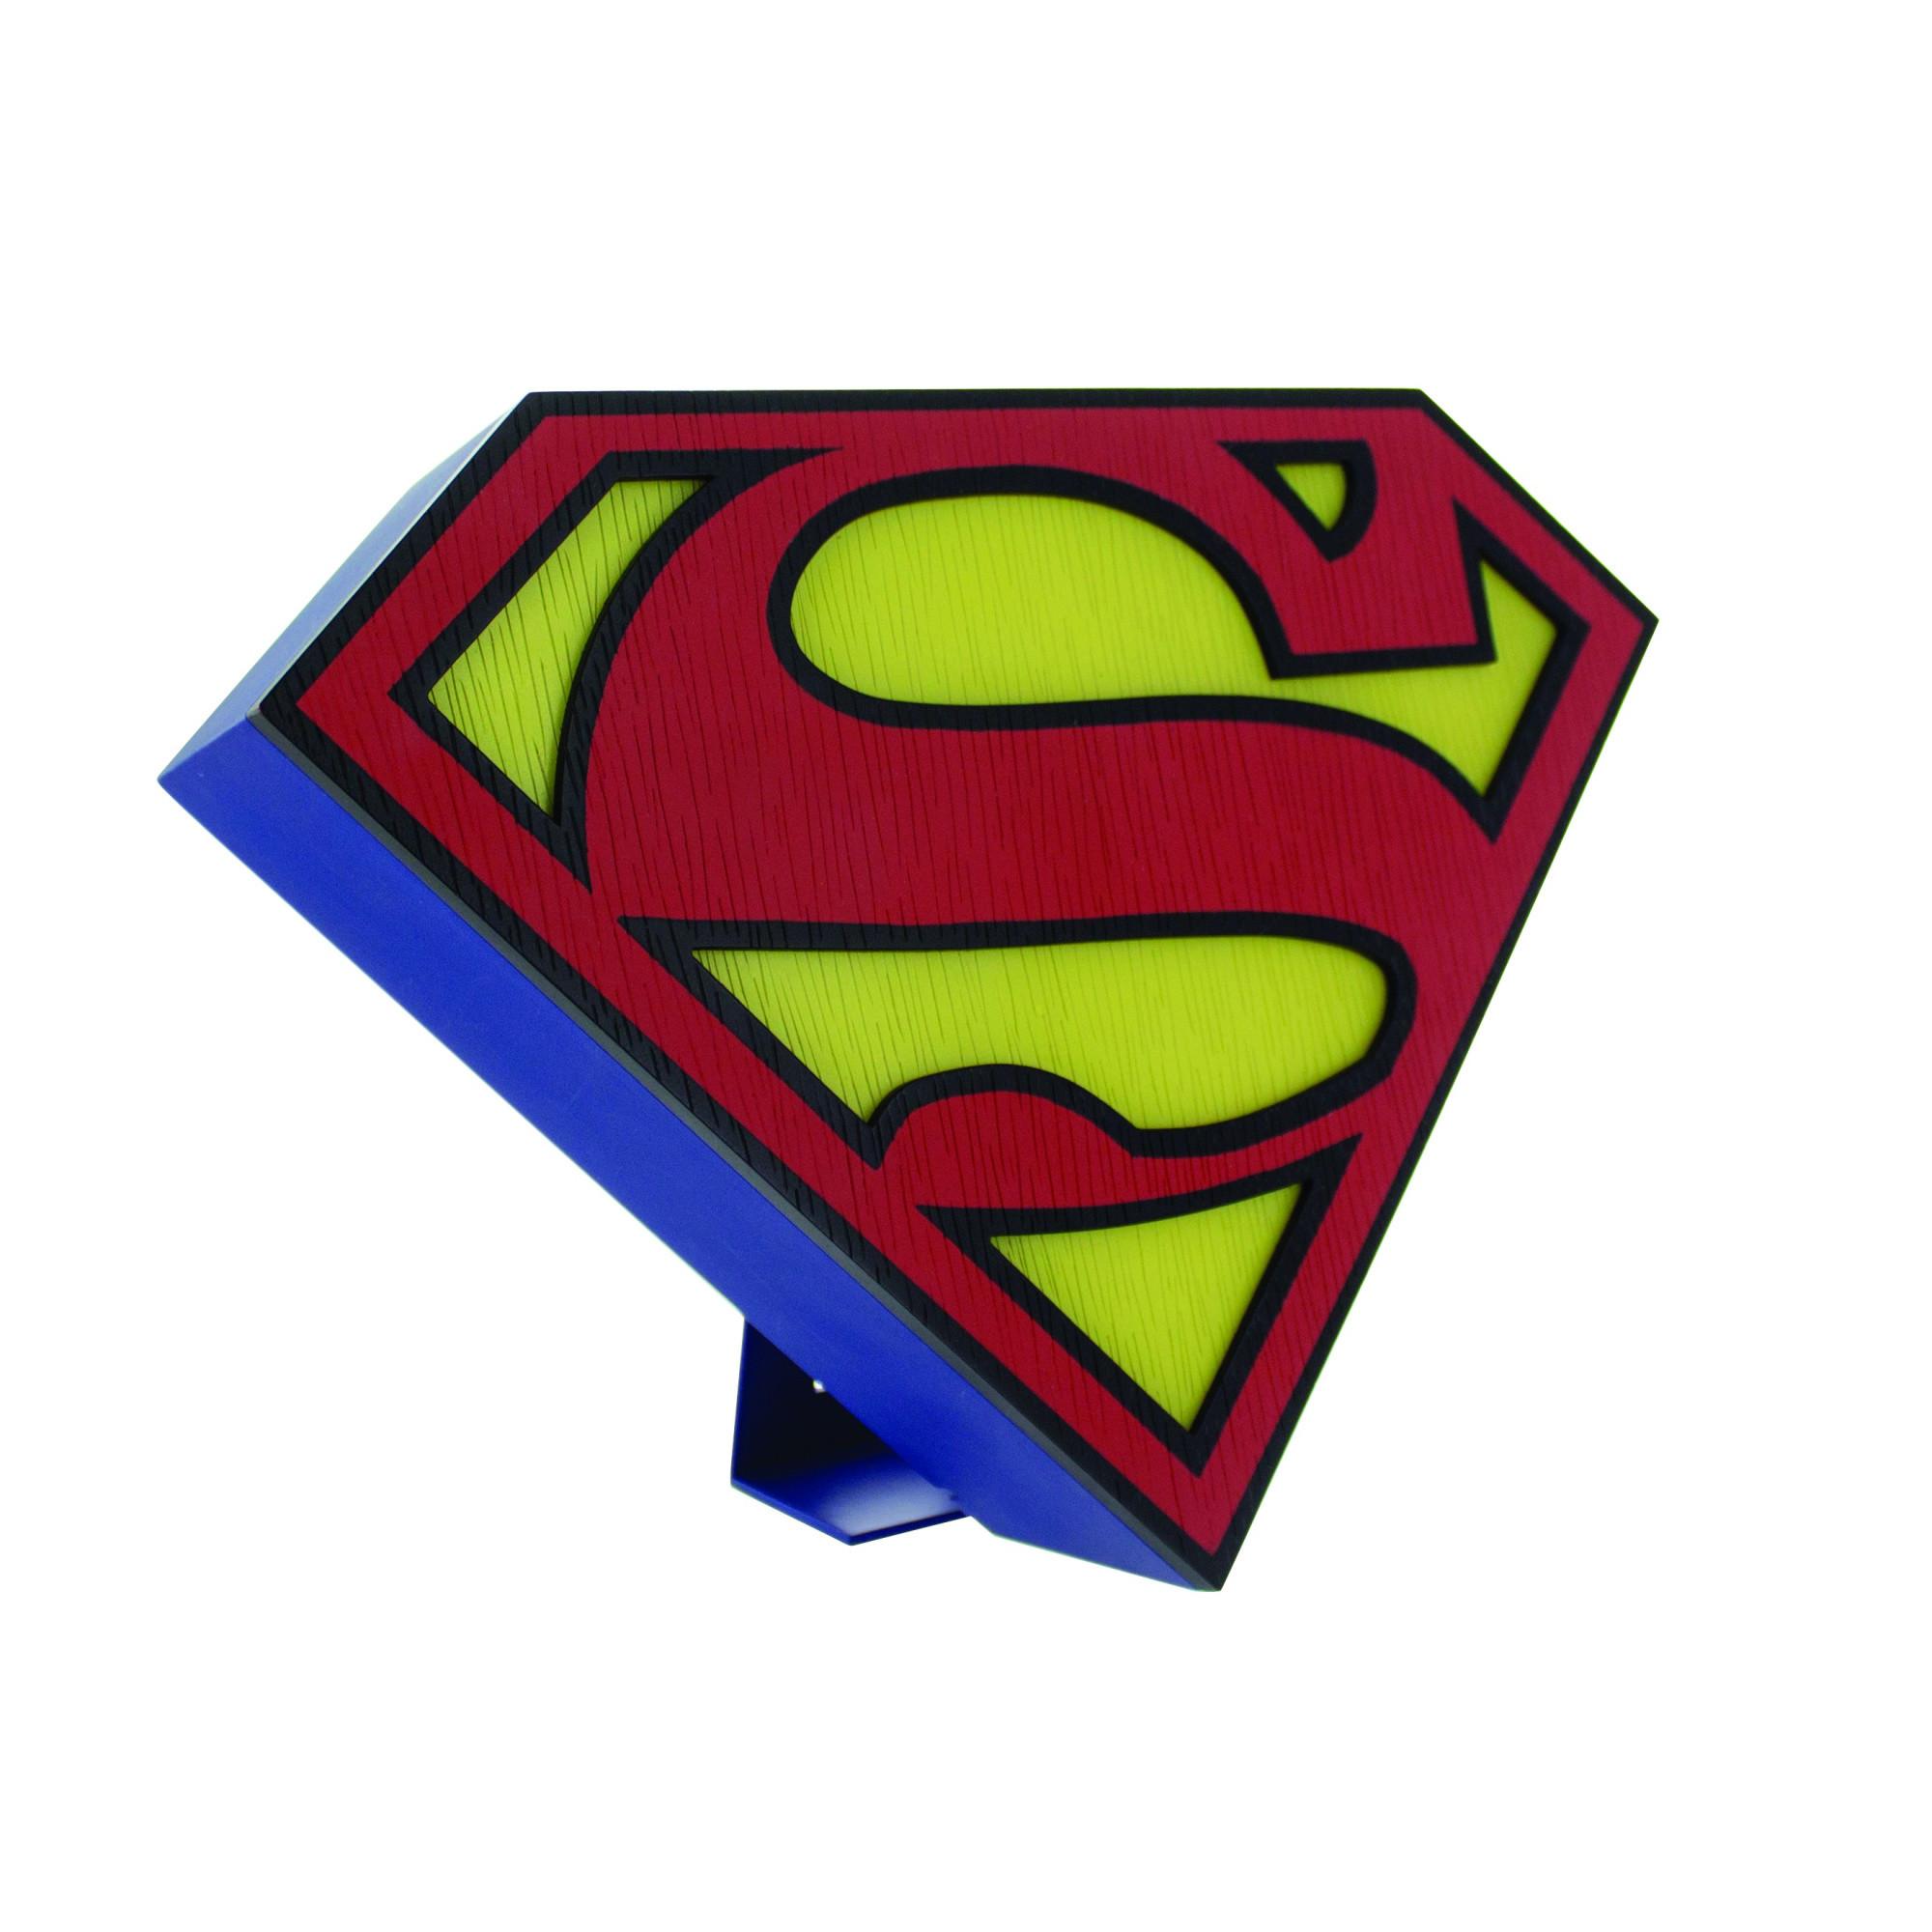 2000x2000 Superman Logo Light Lamp Free Standing Wall Mount Microusb